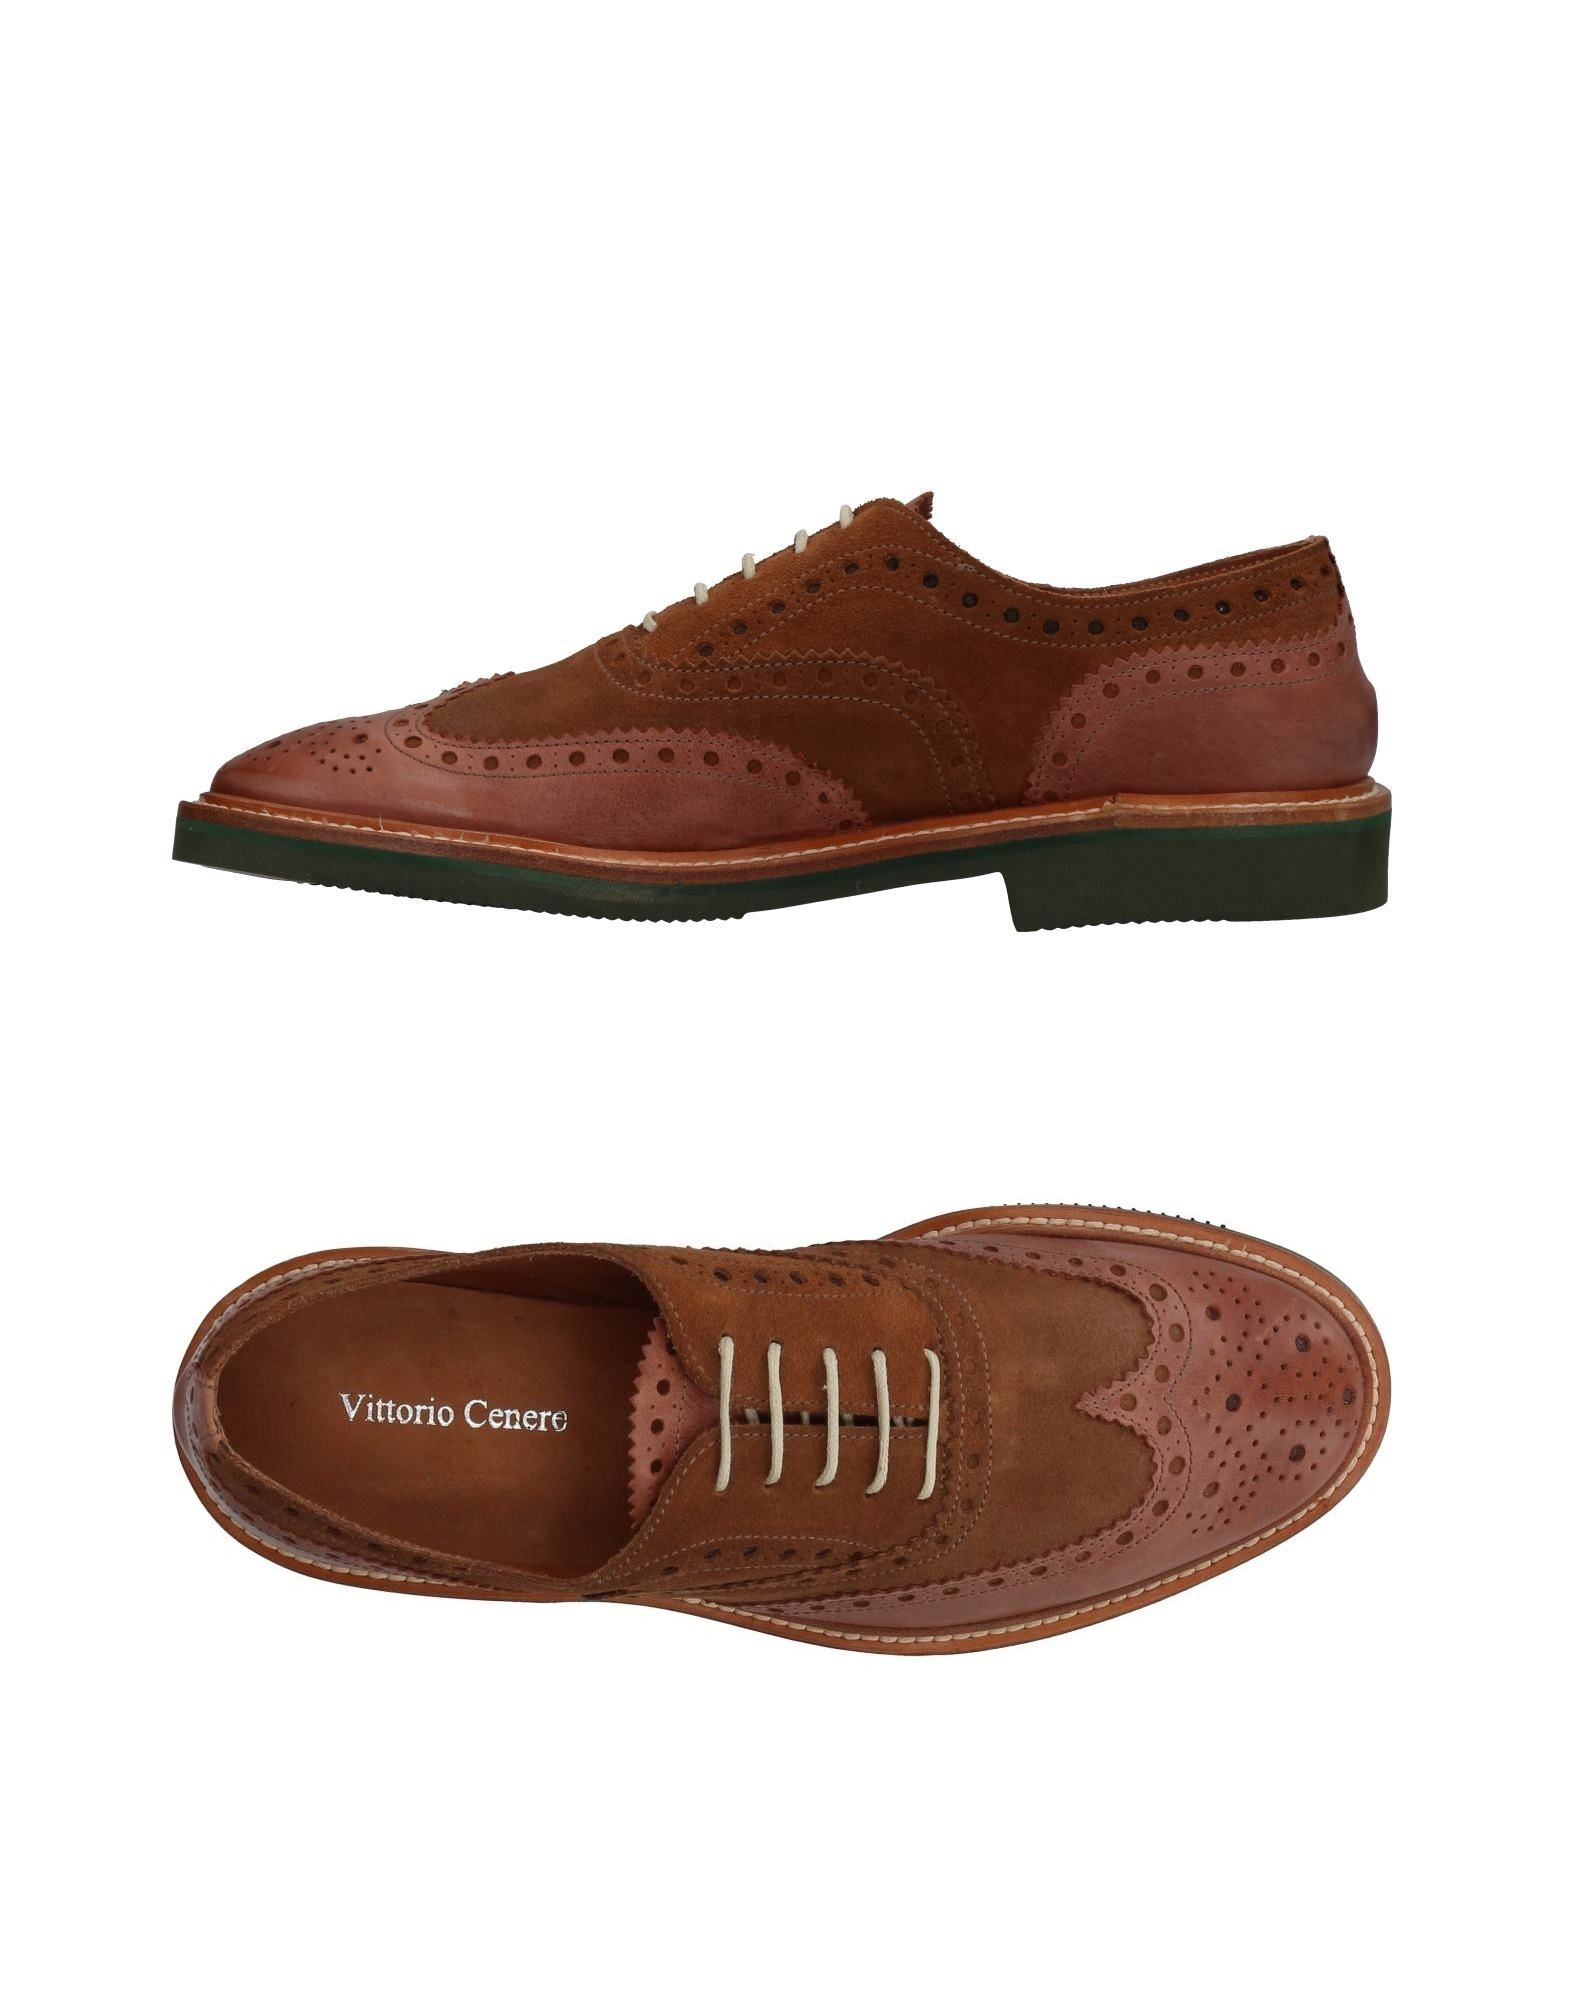 VITTORIO CENERE Обувь на шнурках сумка bruno rossi ml403p cenere